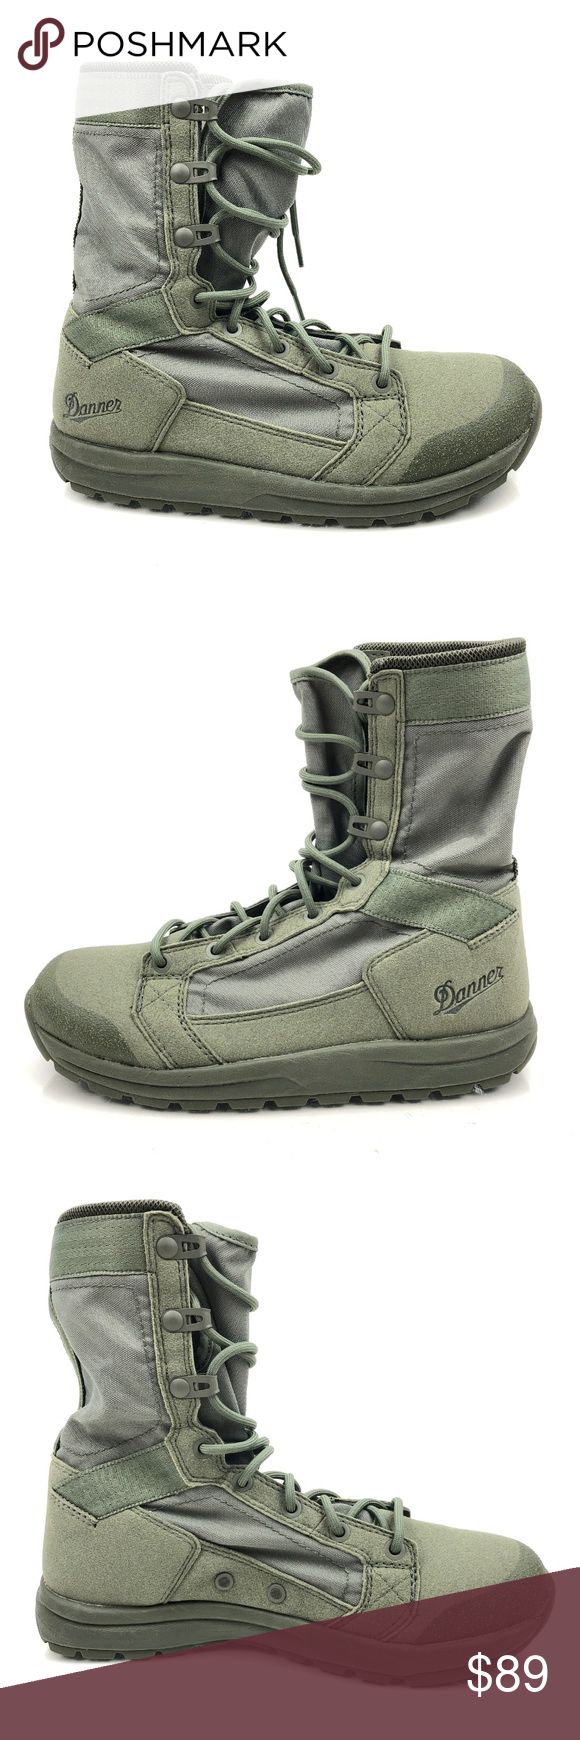 Danner Tachyon Sage Green 8 Combat Boots 50132 In 2020 Combat Boots Boots Shoe Boots